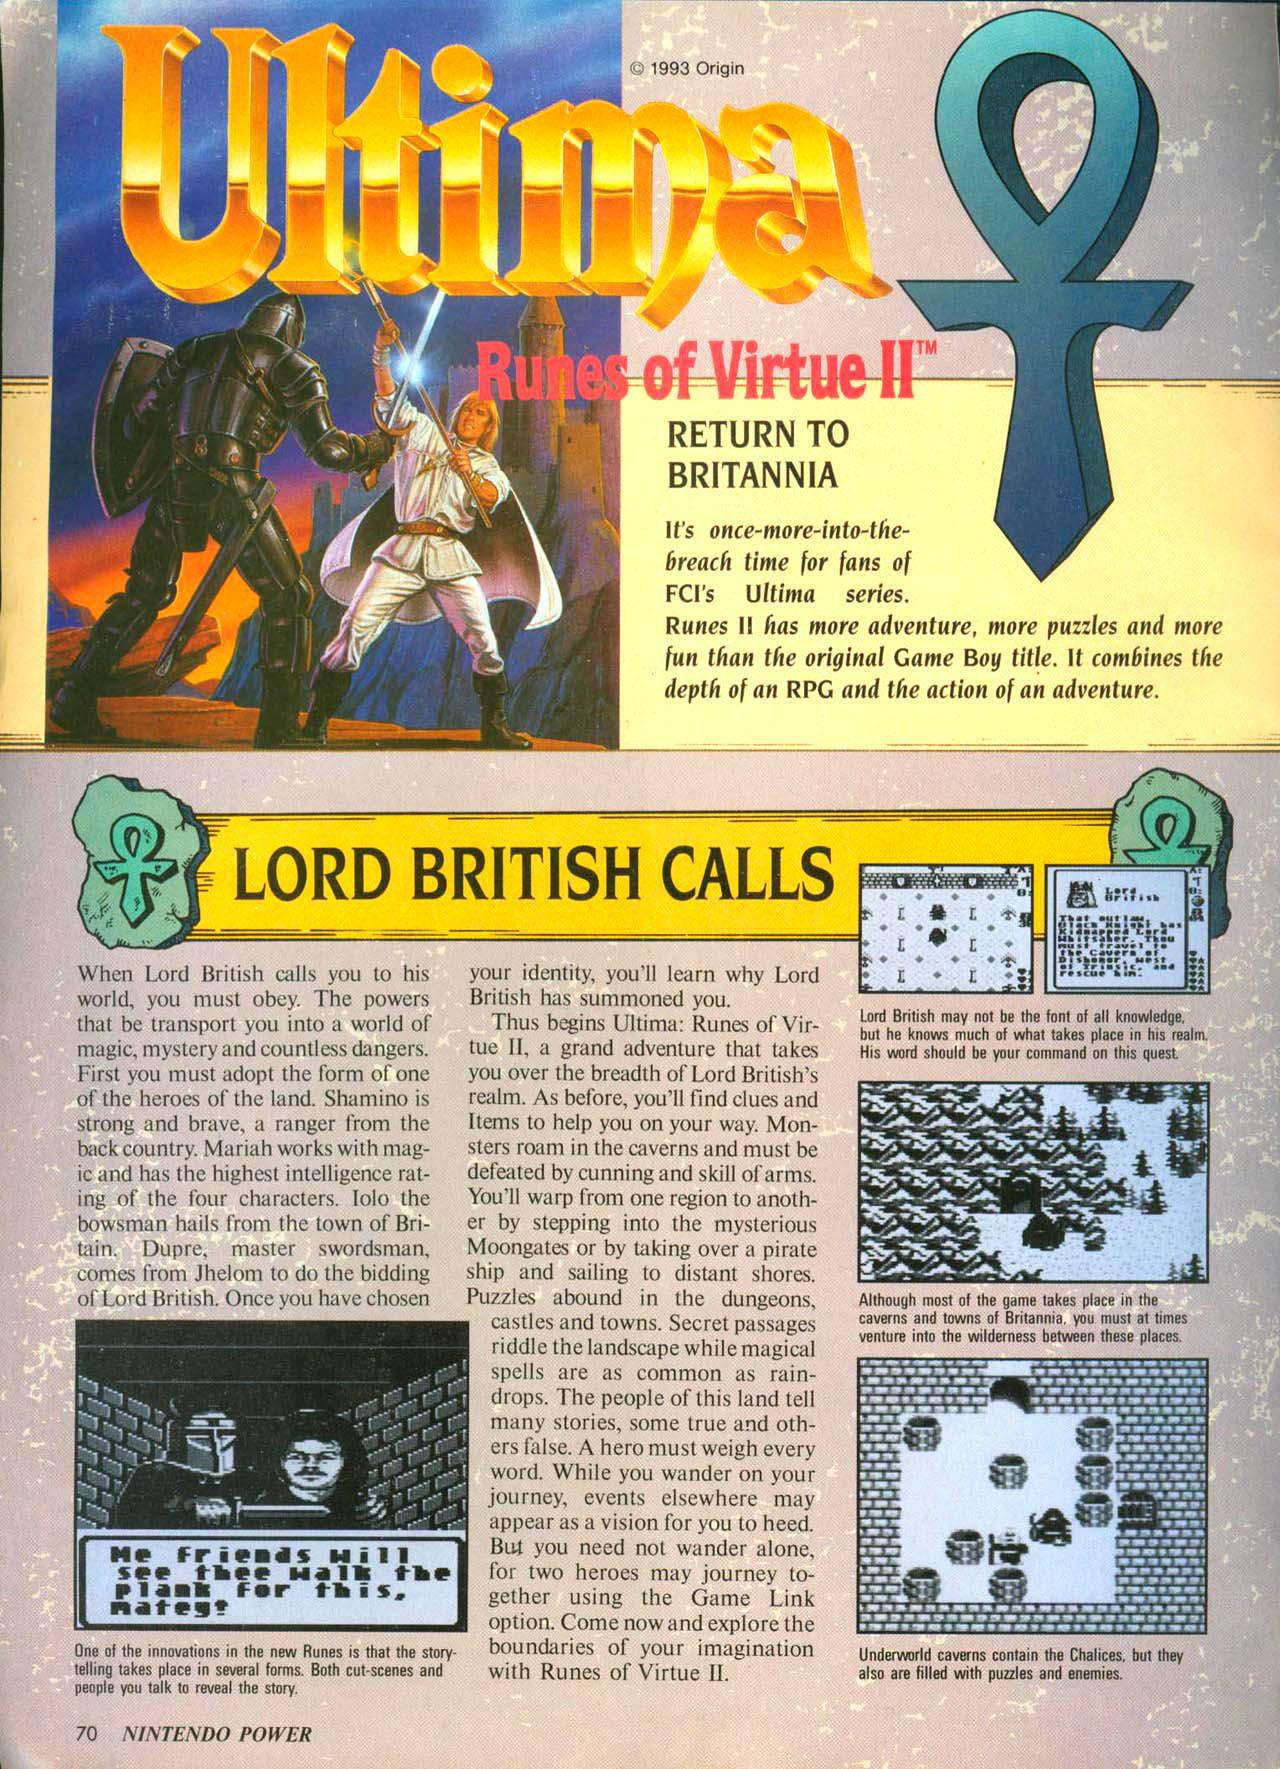 Runes of Virtue II in Nintendo Power circa 1993 – The Origin